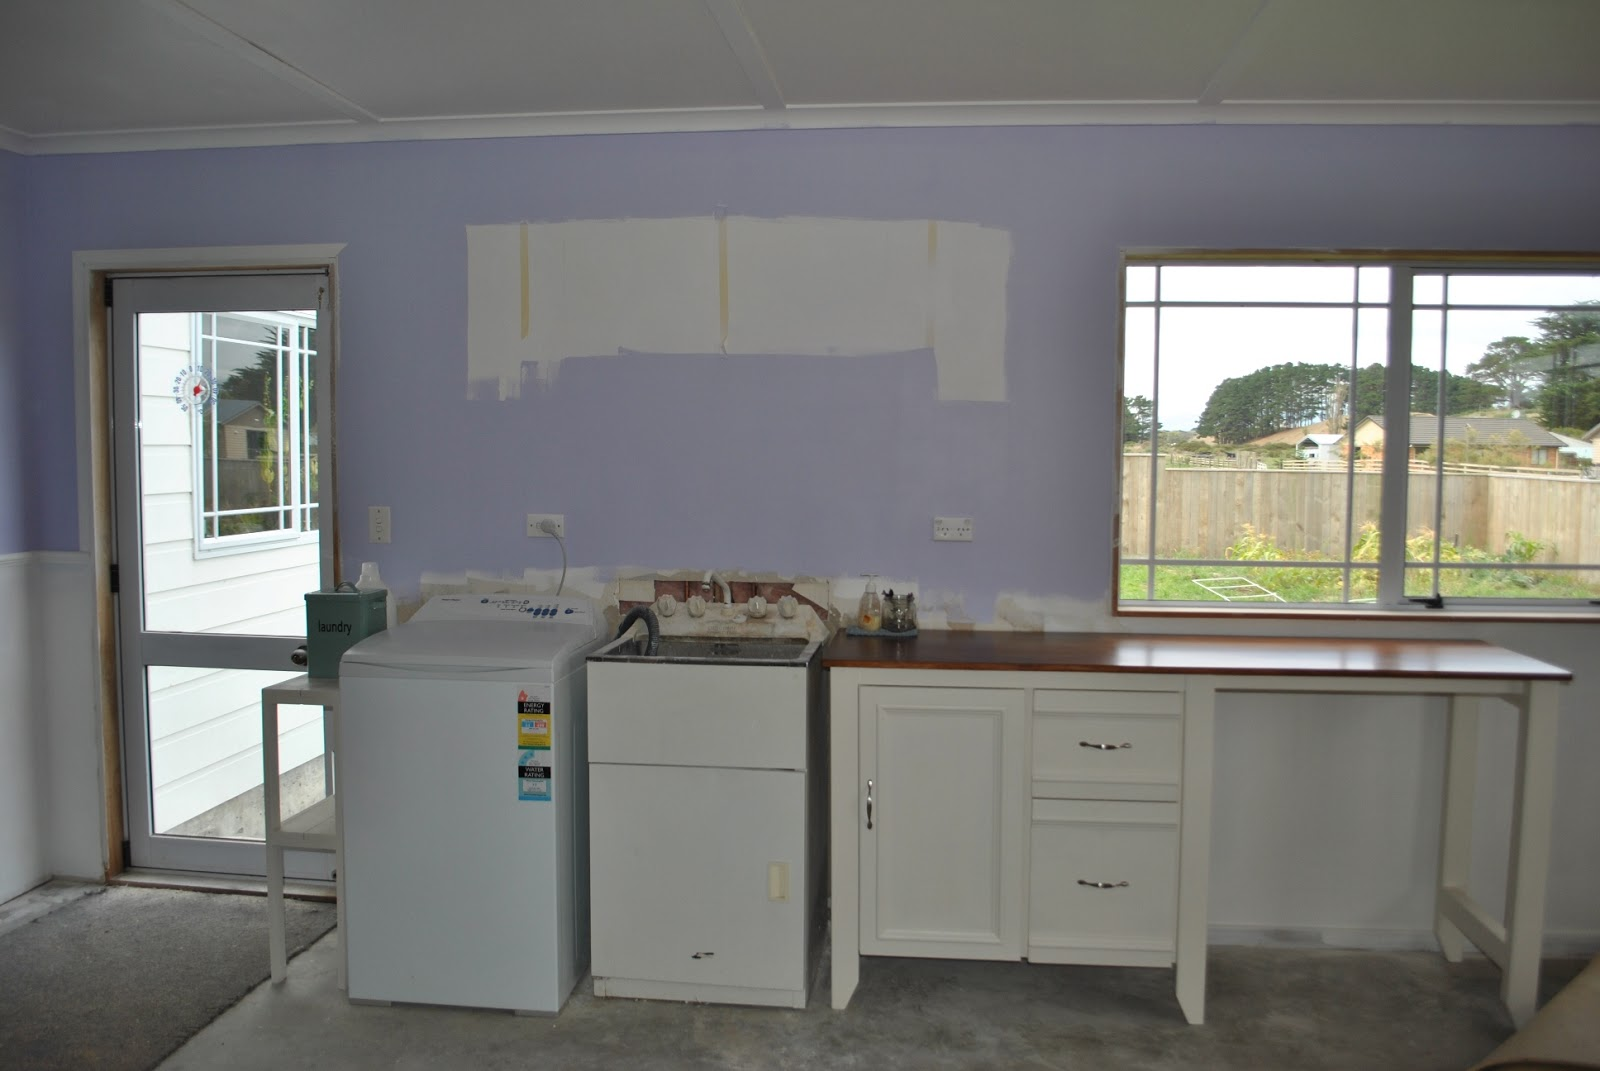 Diy kiwi building laundry wall cabinets solutioingenieria Choice Image